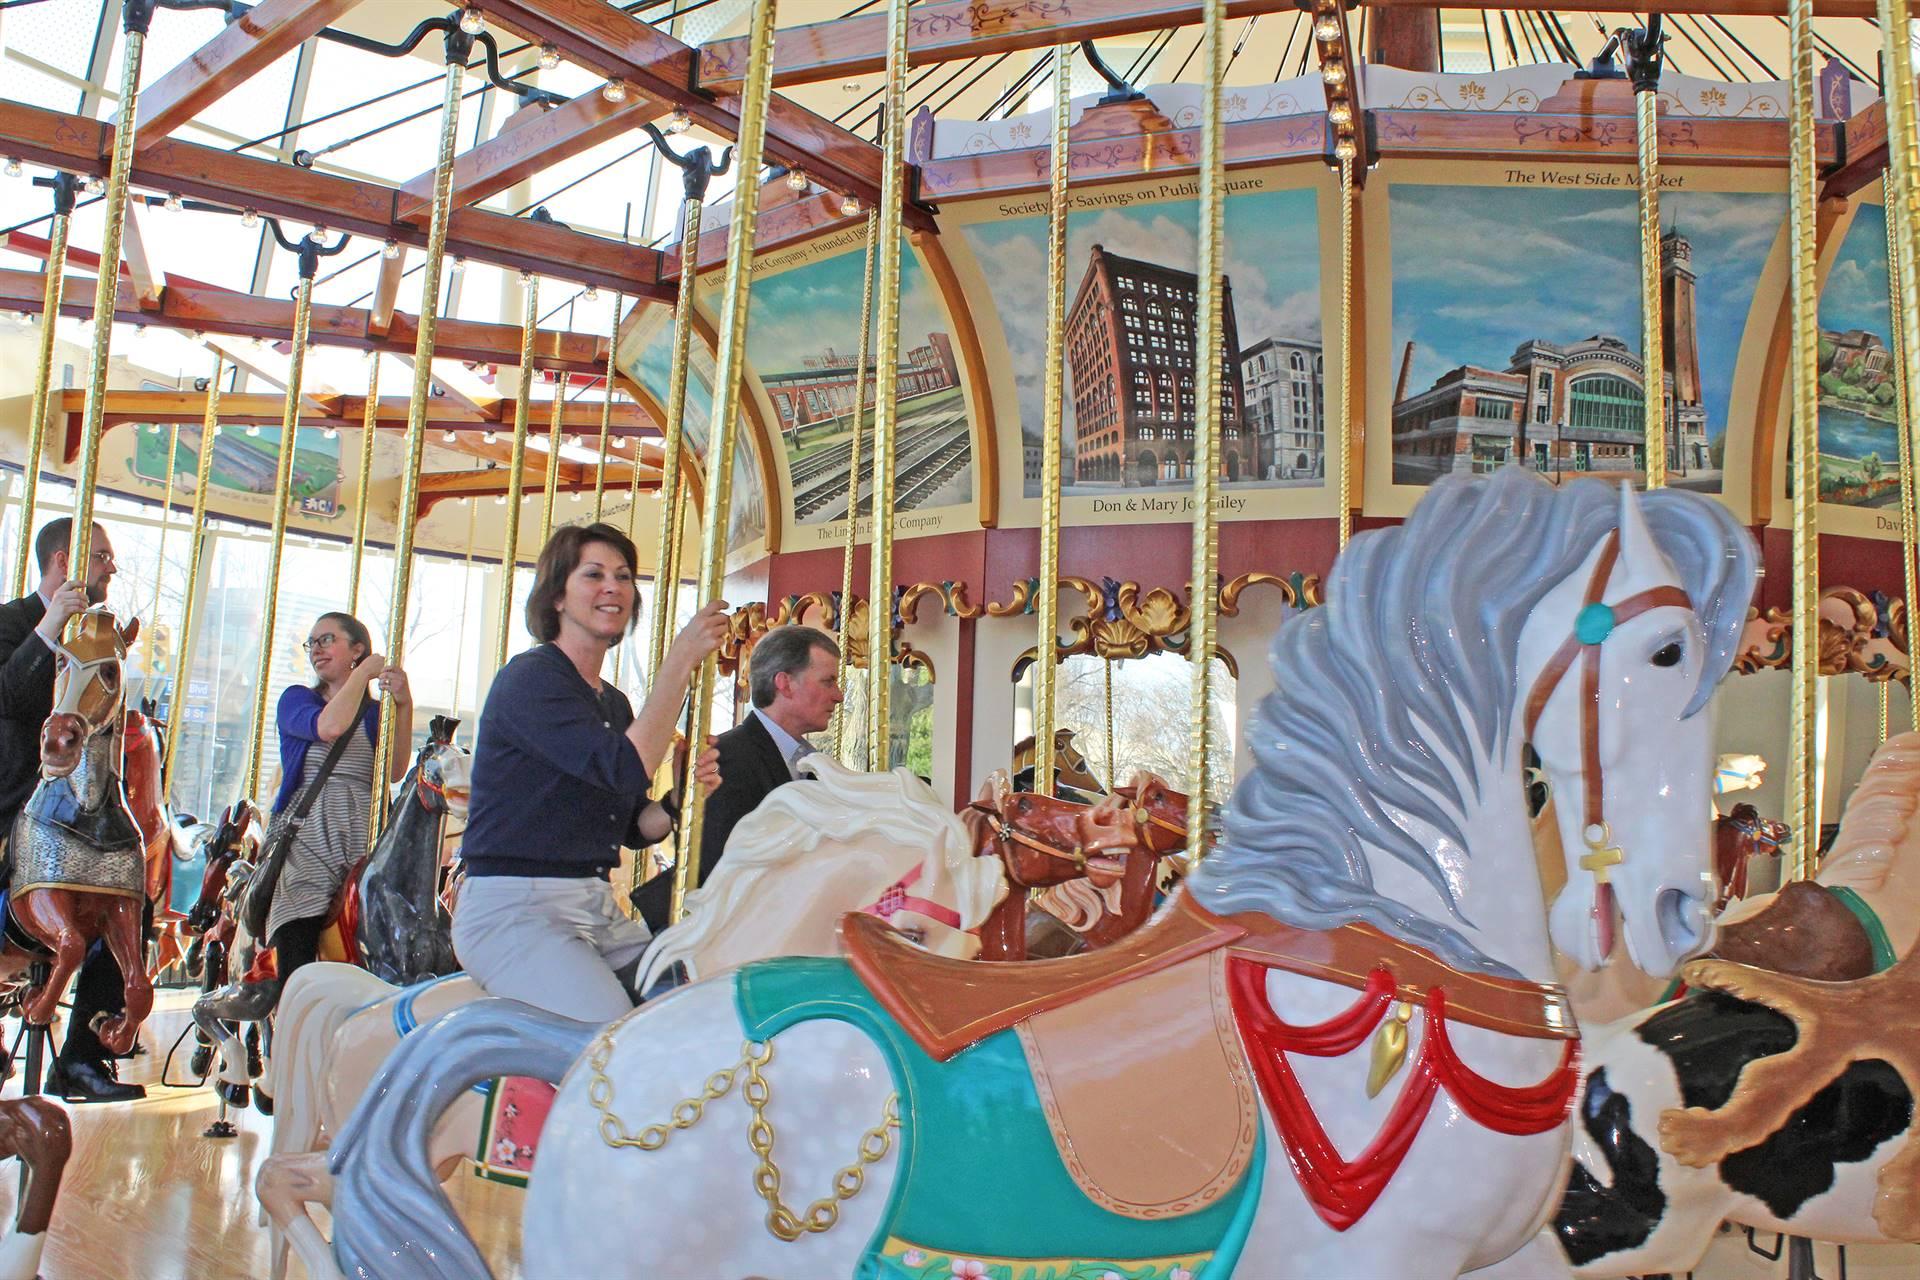 Carousel-Riders